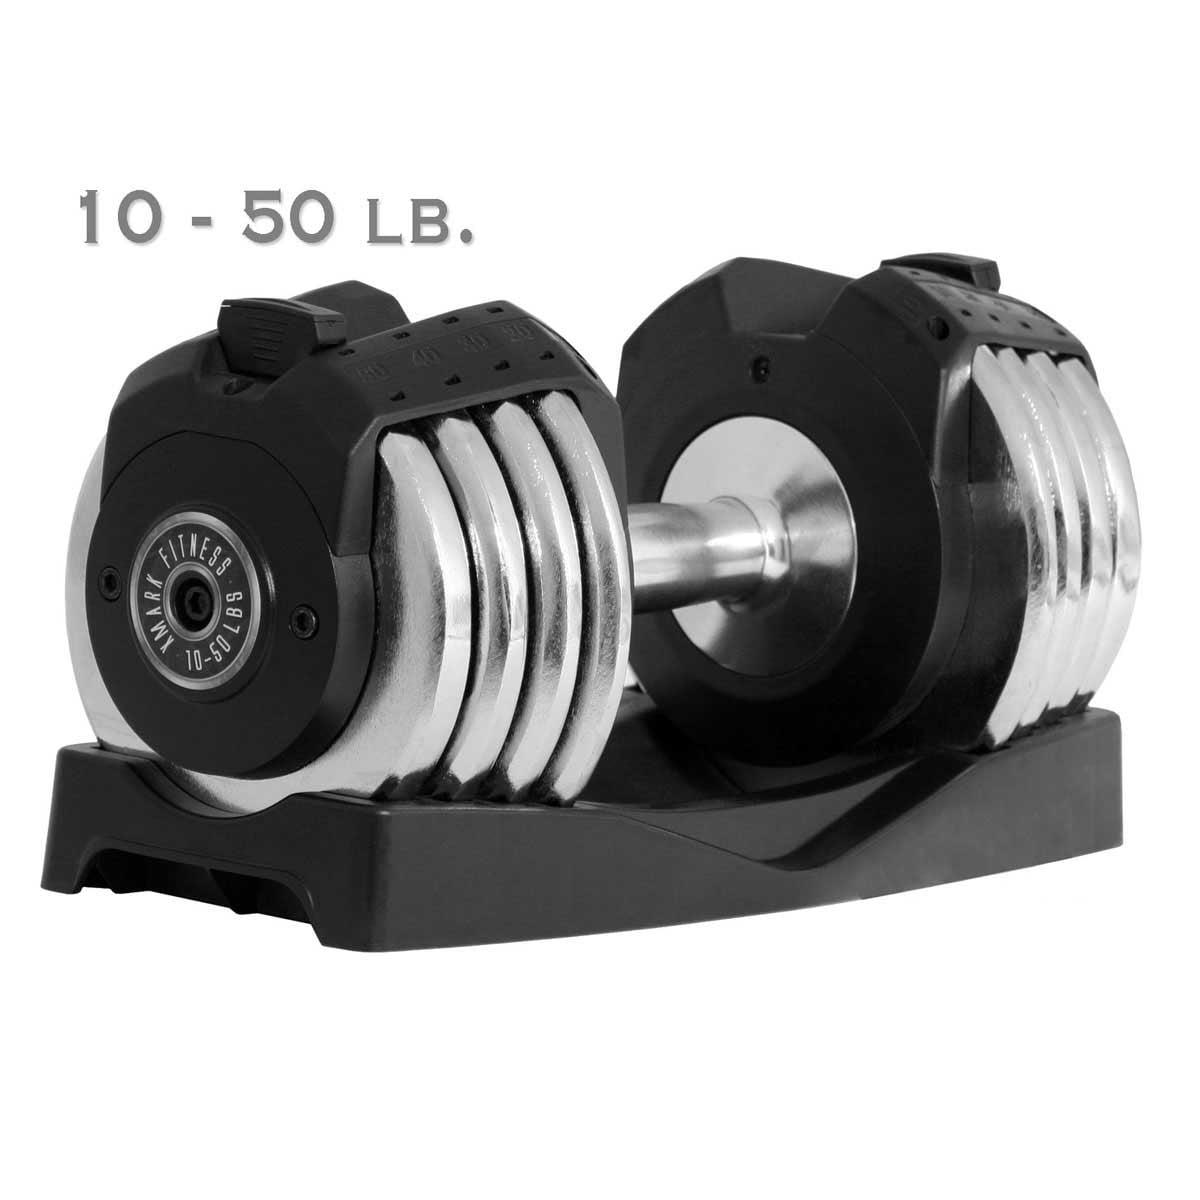 XMark 50 lb. Adjustable Dumbbell-Single